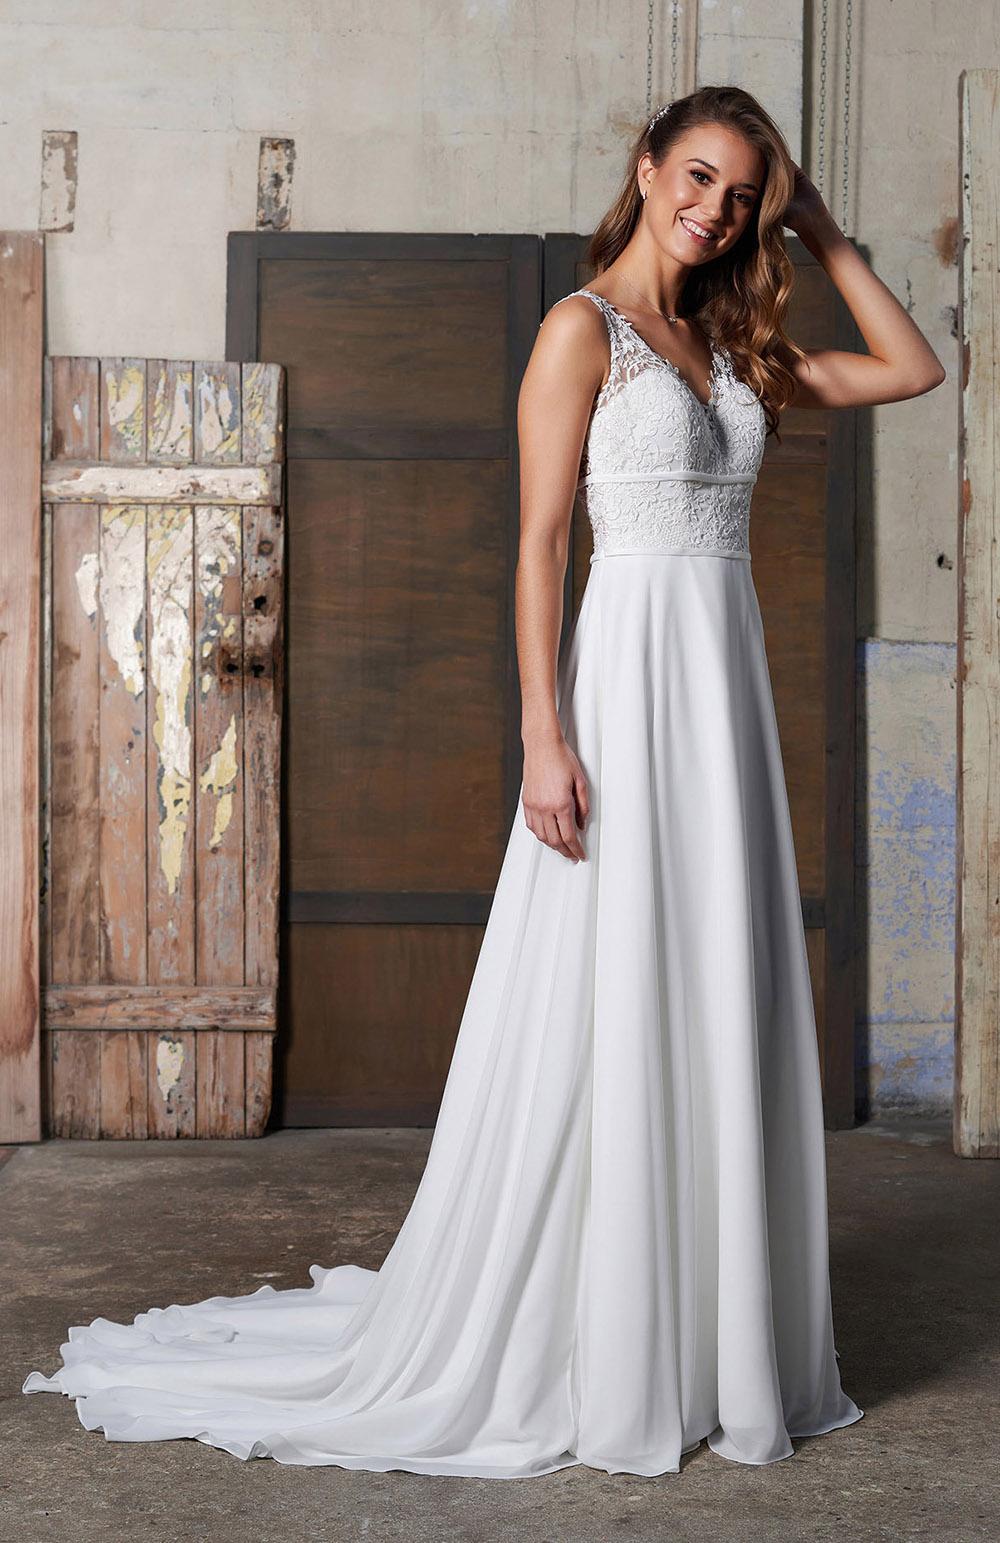 Robe de mariée Modèle Judie